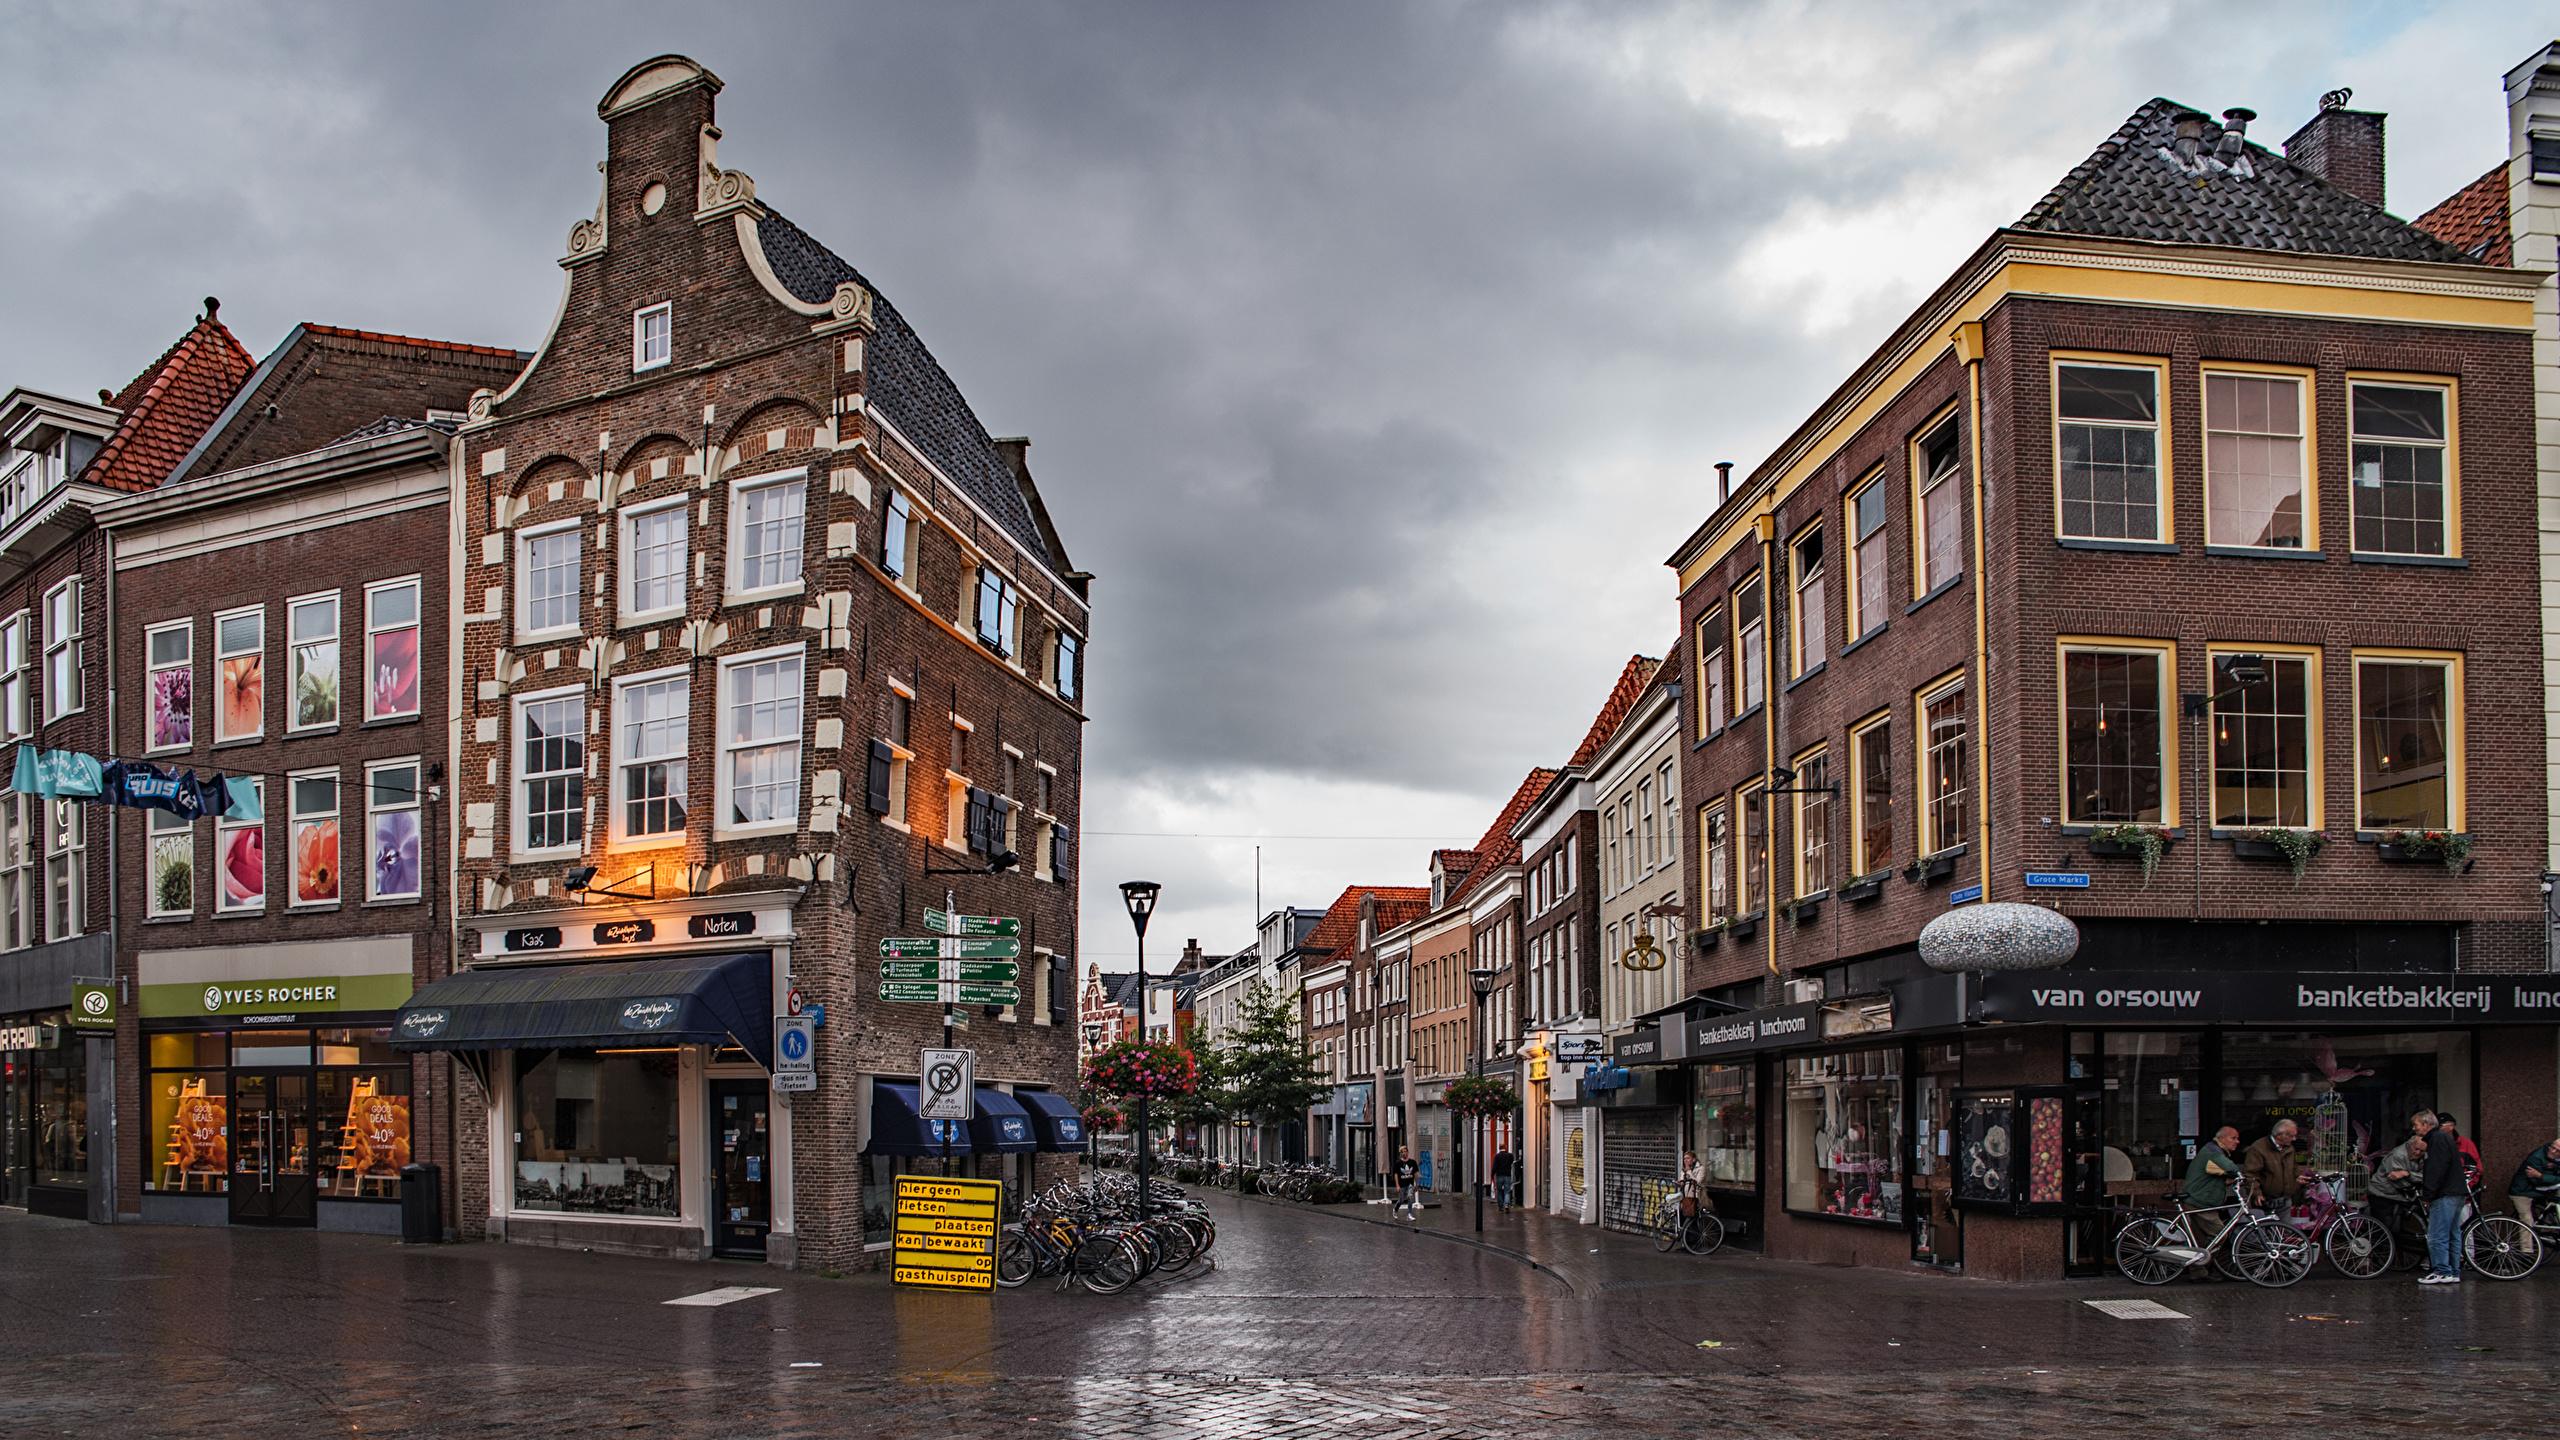 Fondos De Pantalla 2560x1440 Países Bajos Casa Zwolle Calle